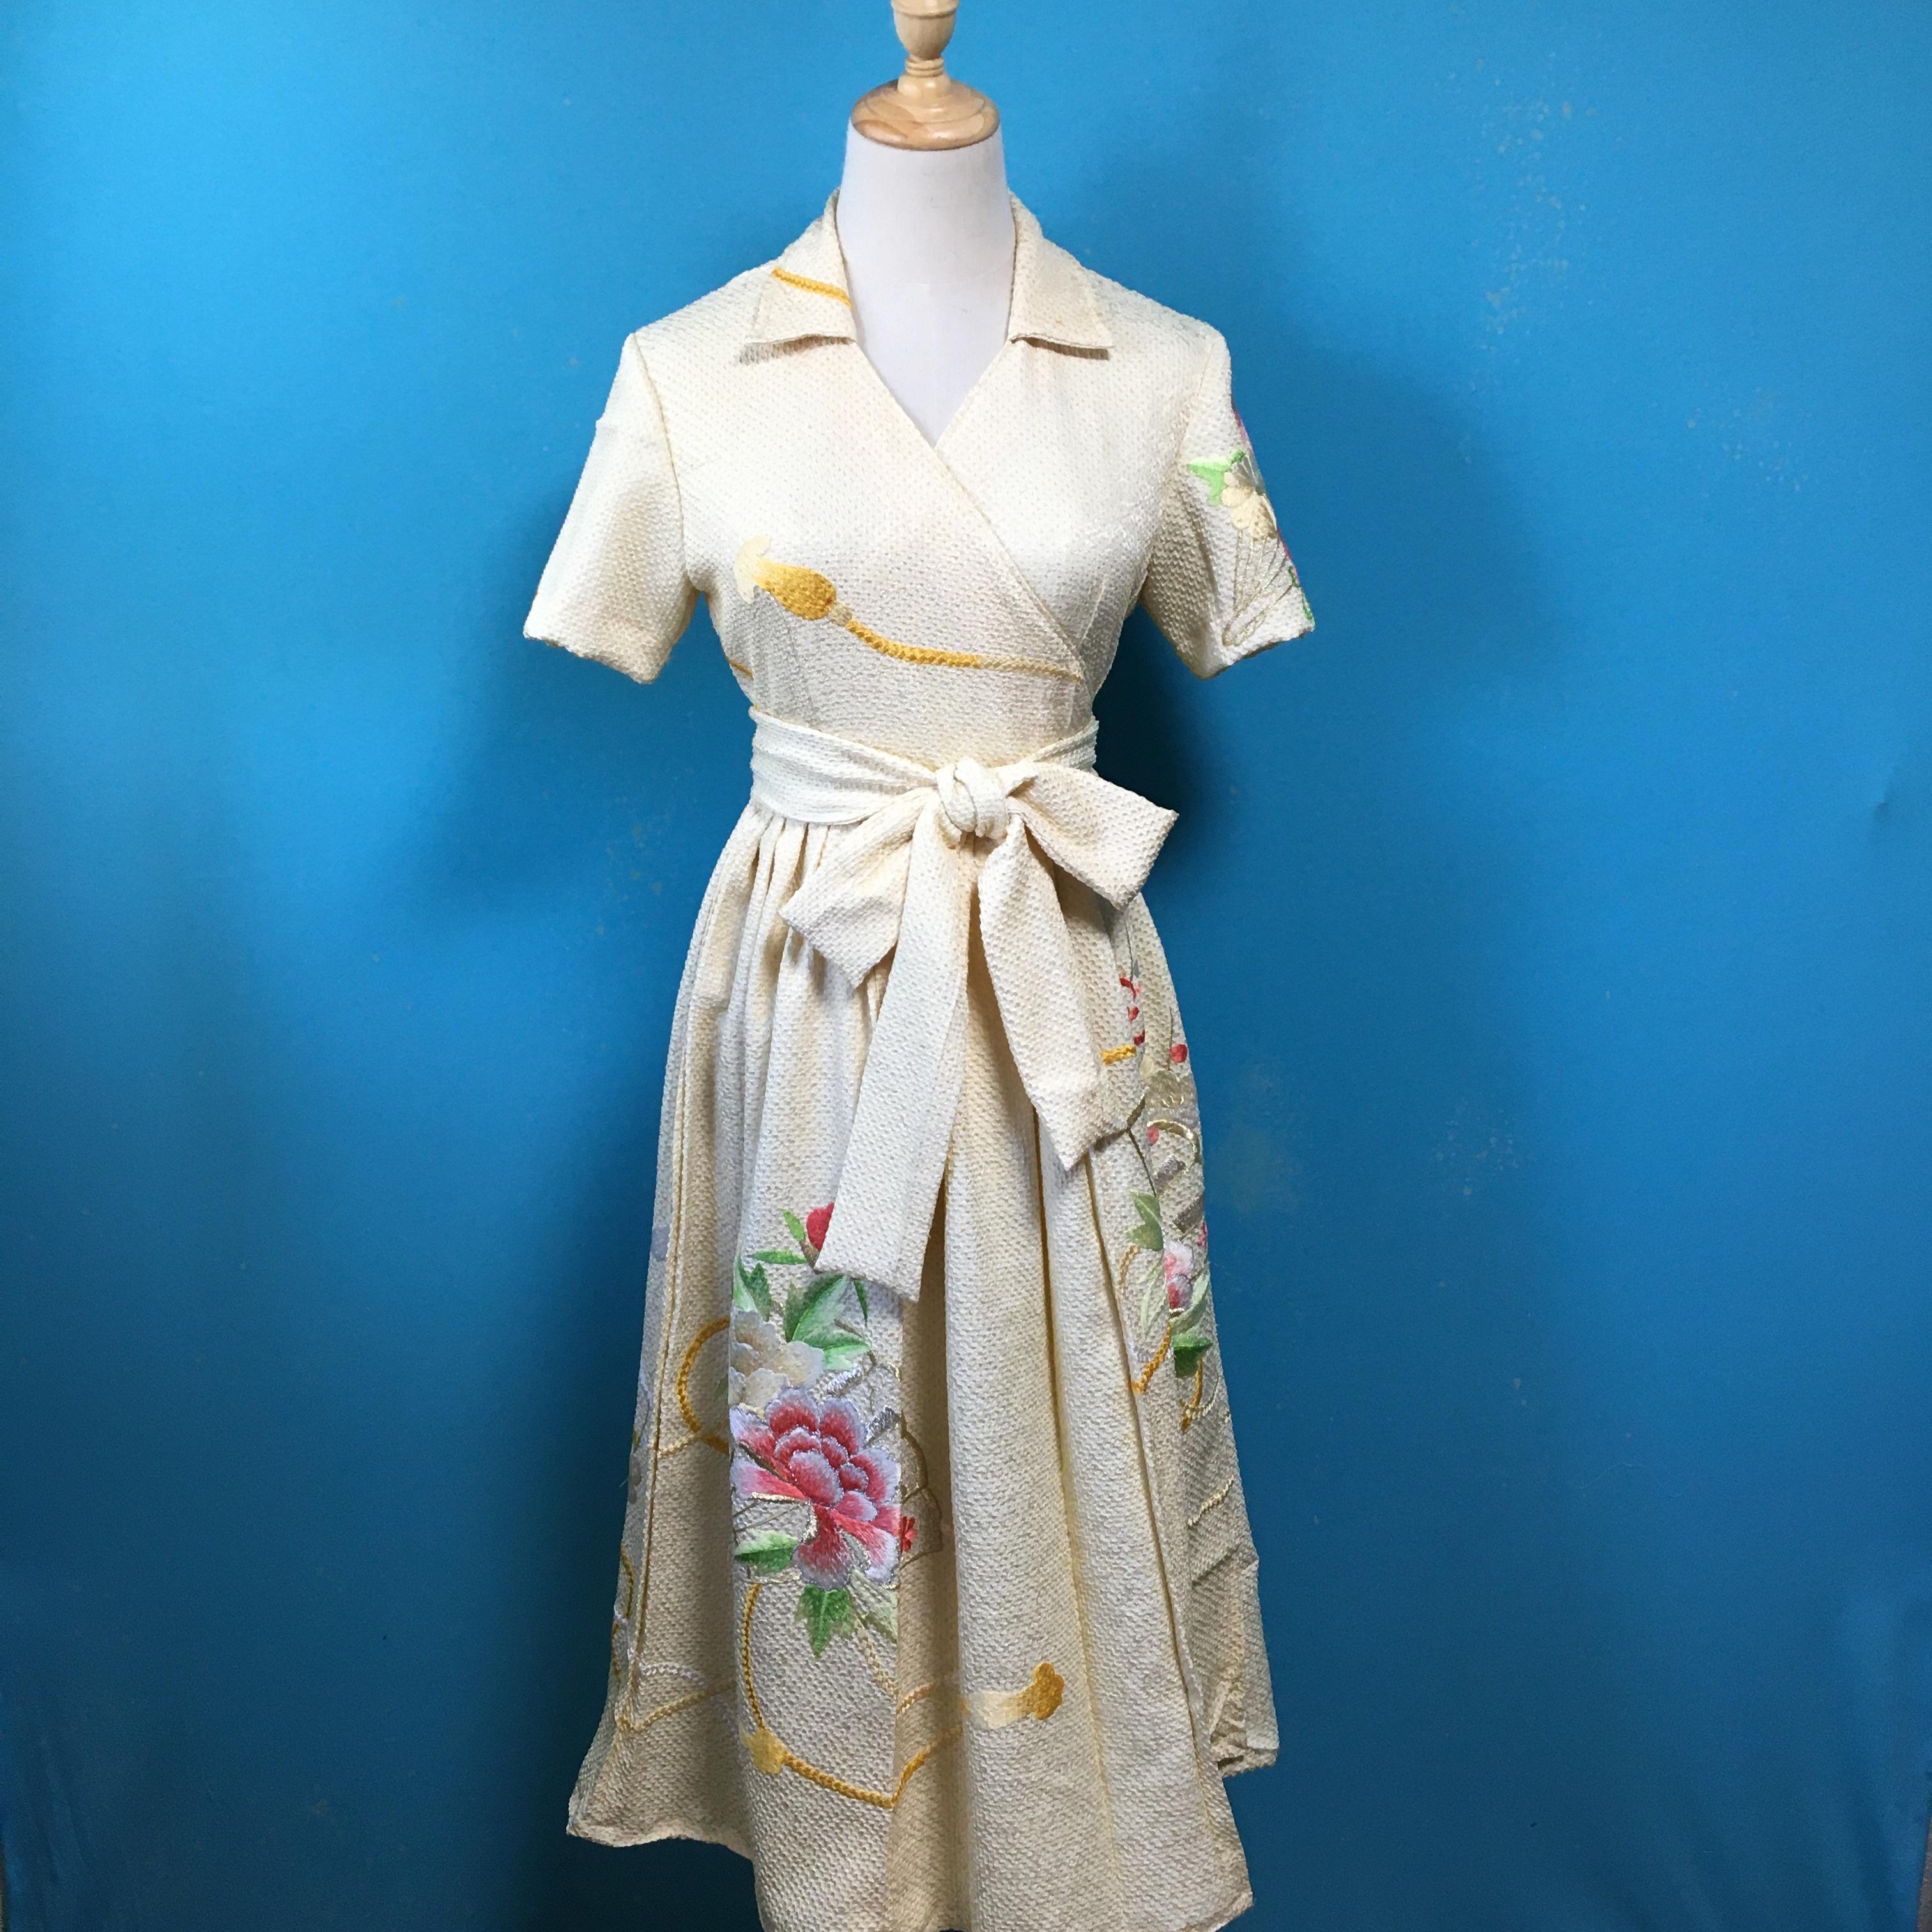 Vintage kimono wrap dress/ US 6, 振袖